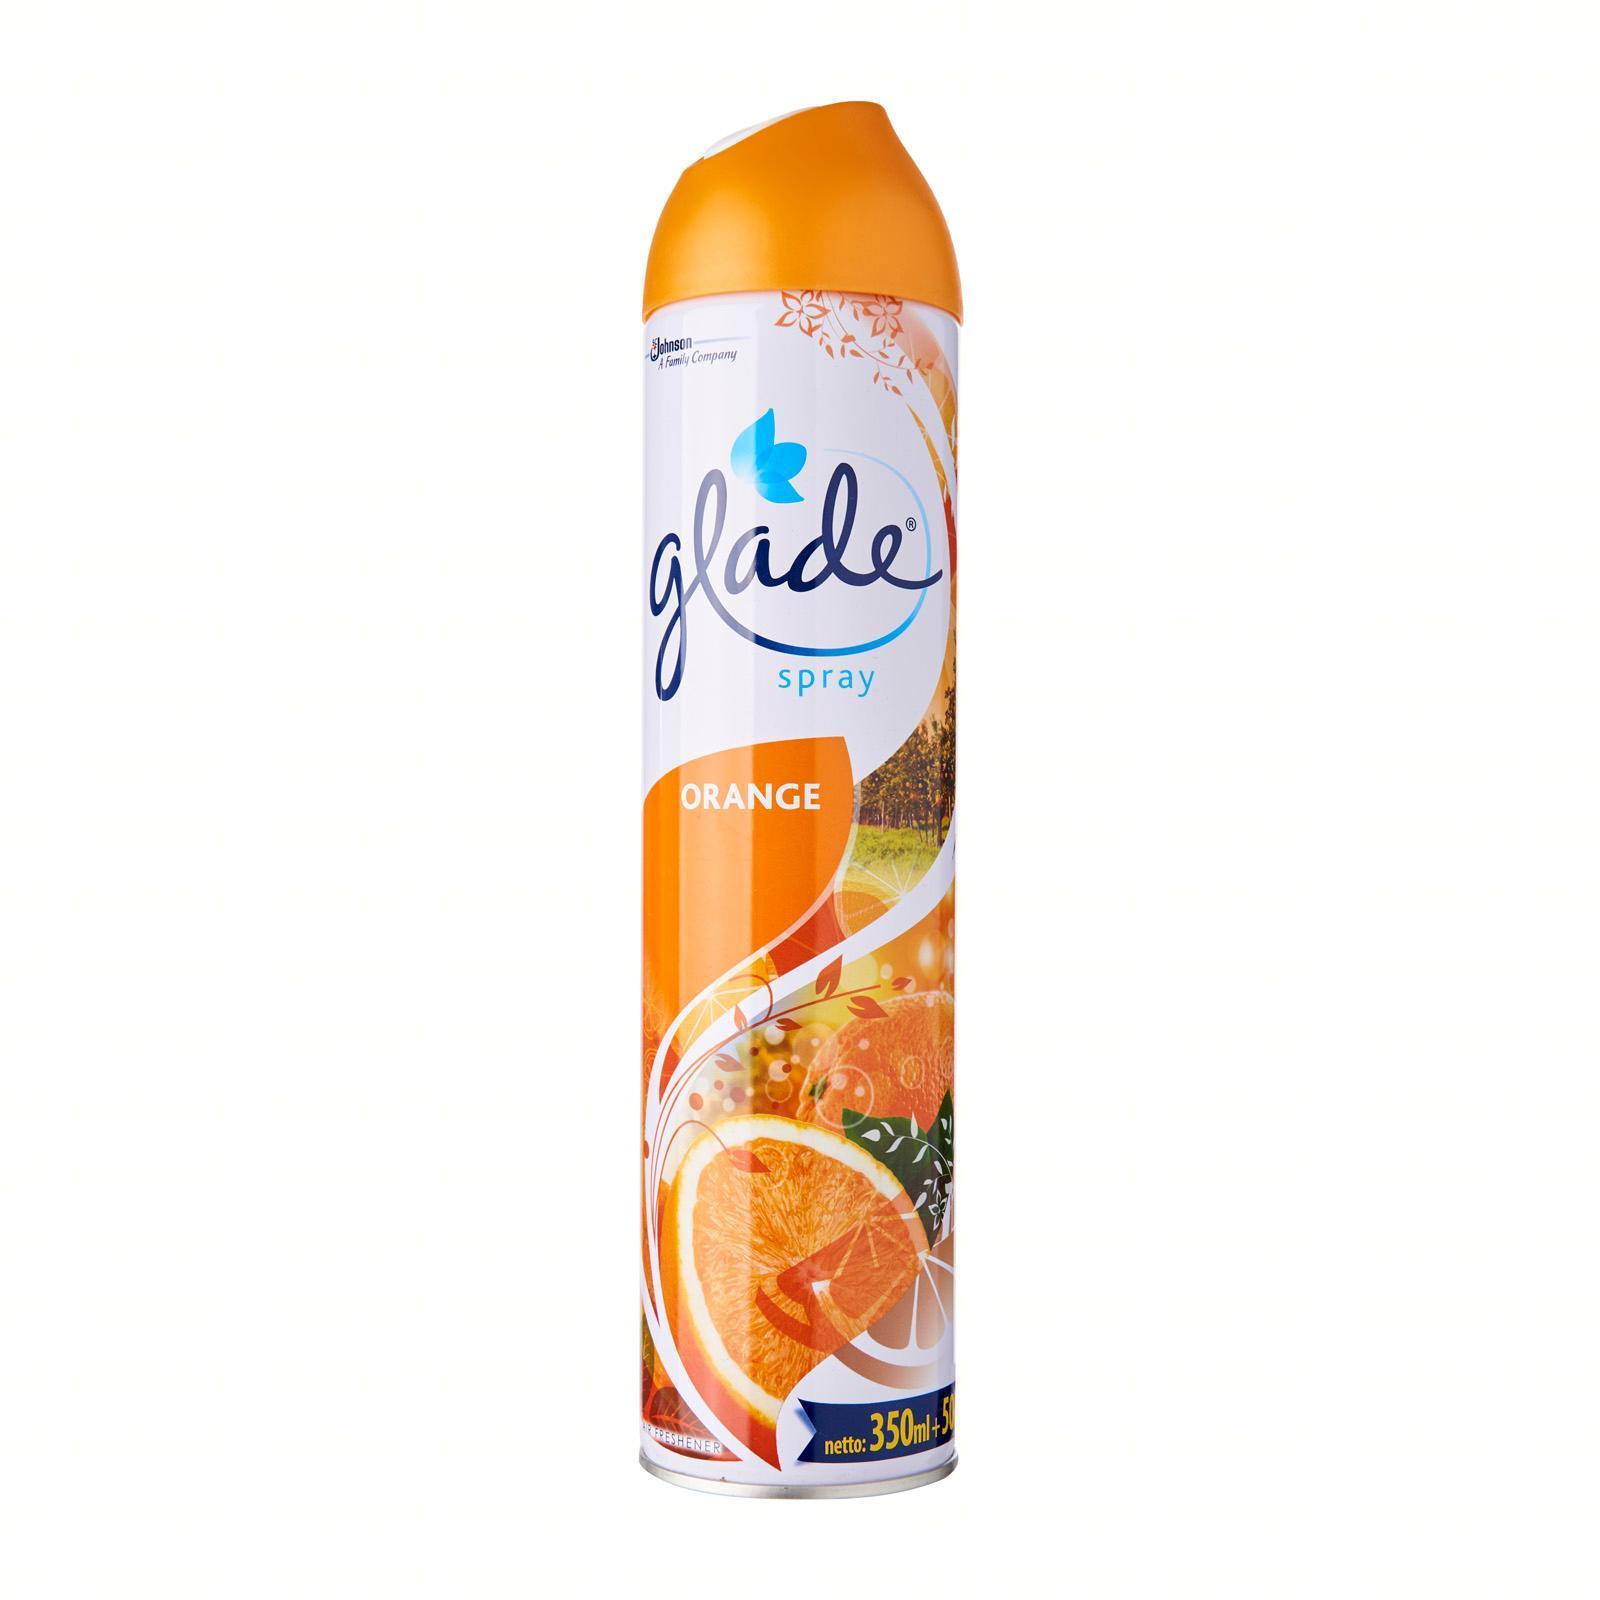 GLADE Aerosol Orange - By Prestigio Delights